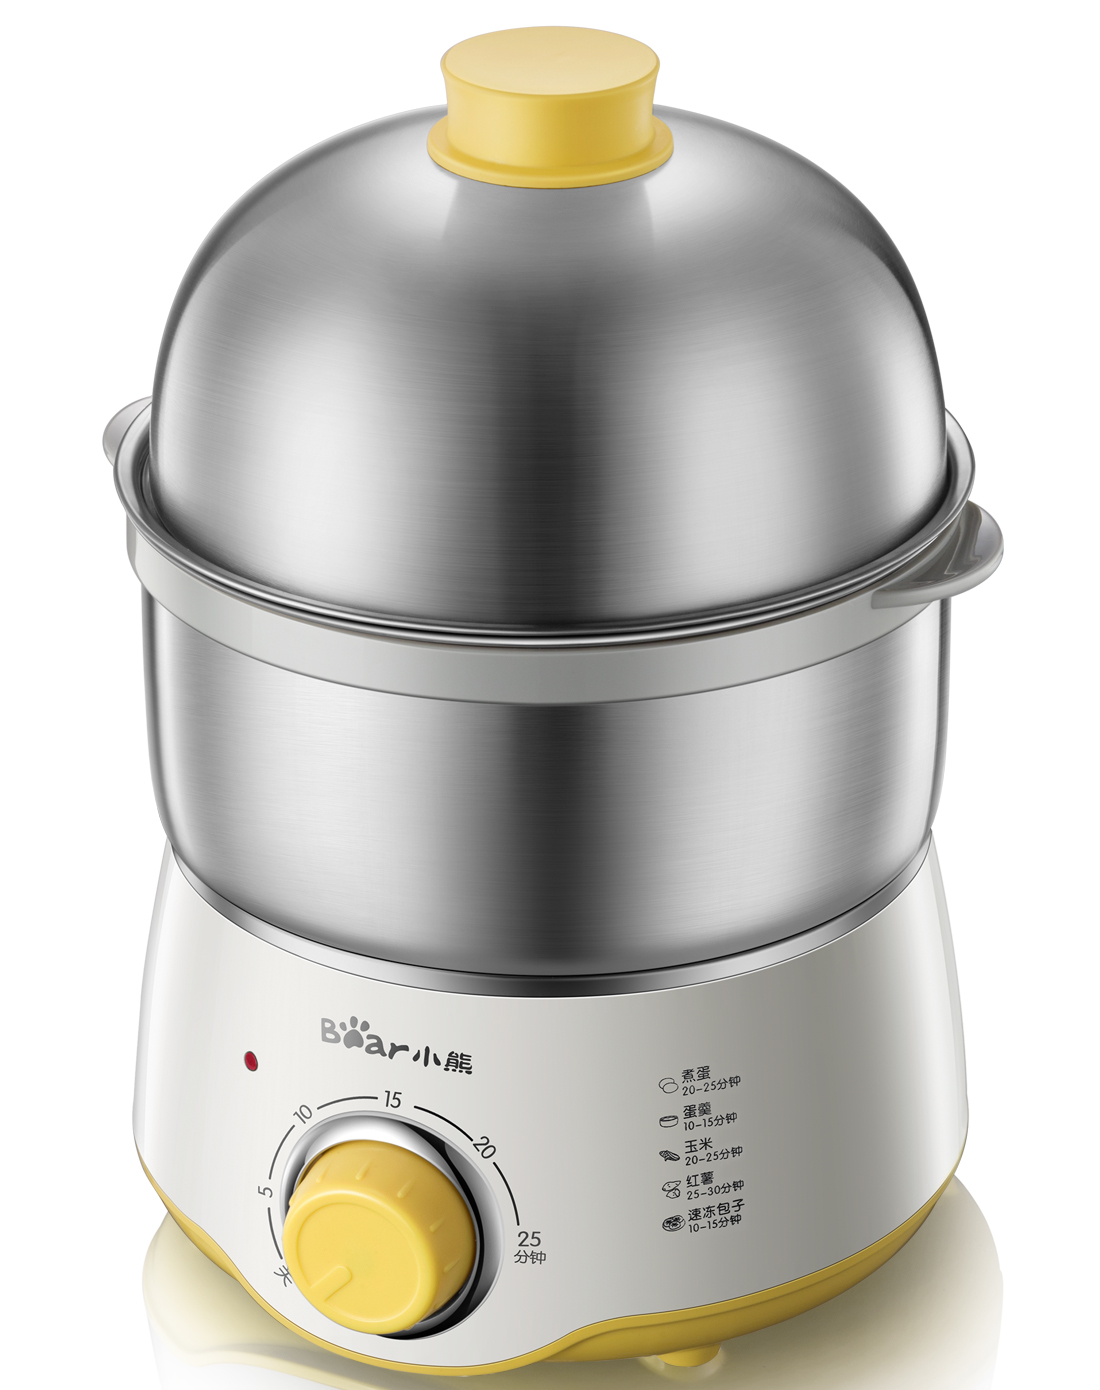 Bear-小熊 ZDQ-A07U1煮蛋器小型迷你蒸蛋器双层炖蛋器不锈钢电器